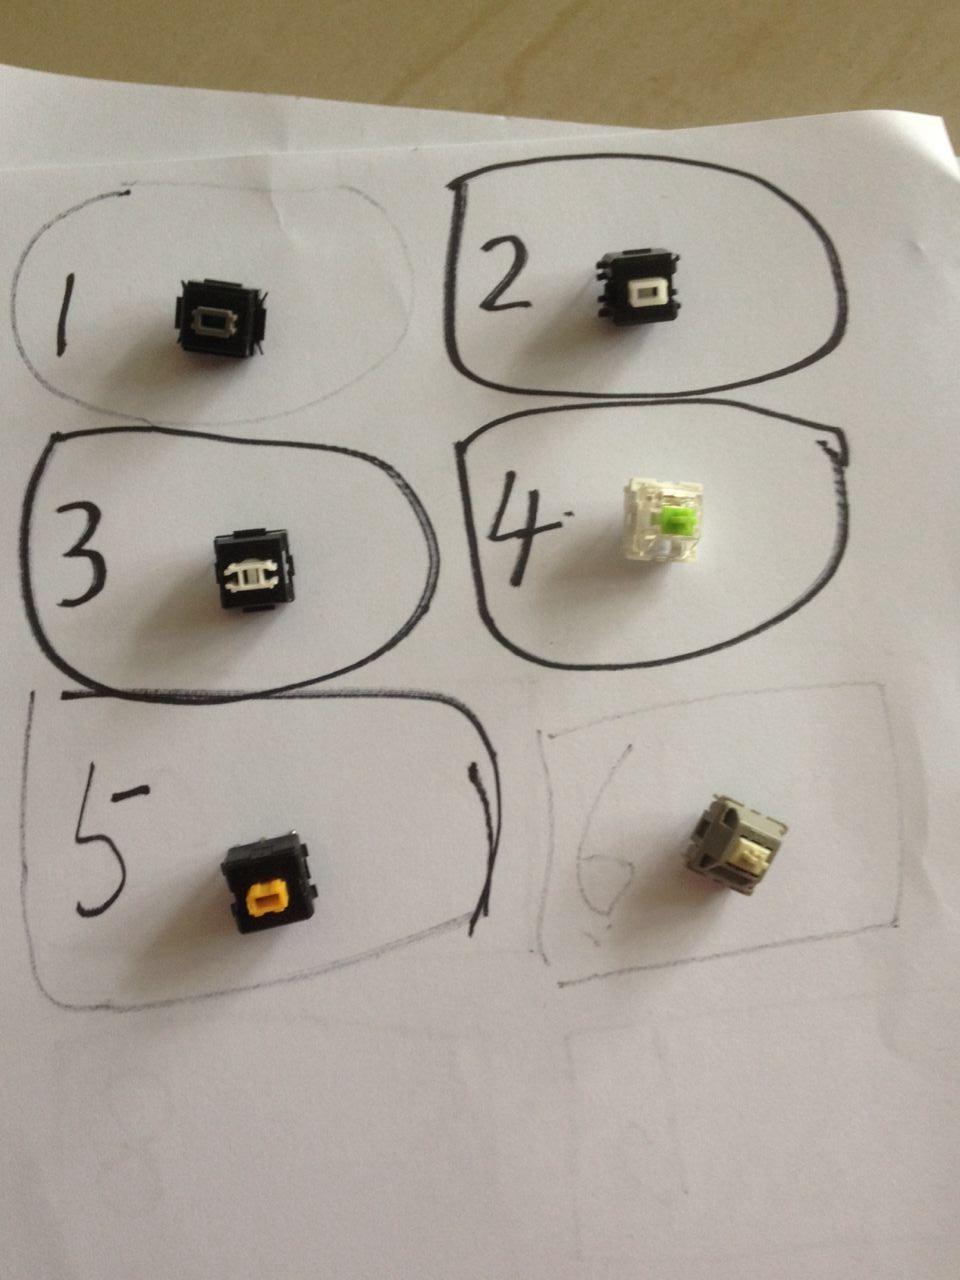 3pcs keyboard switch family  Pls choice any one(NO 1 or NO 2 NO 3....) human capital and family size choice